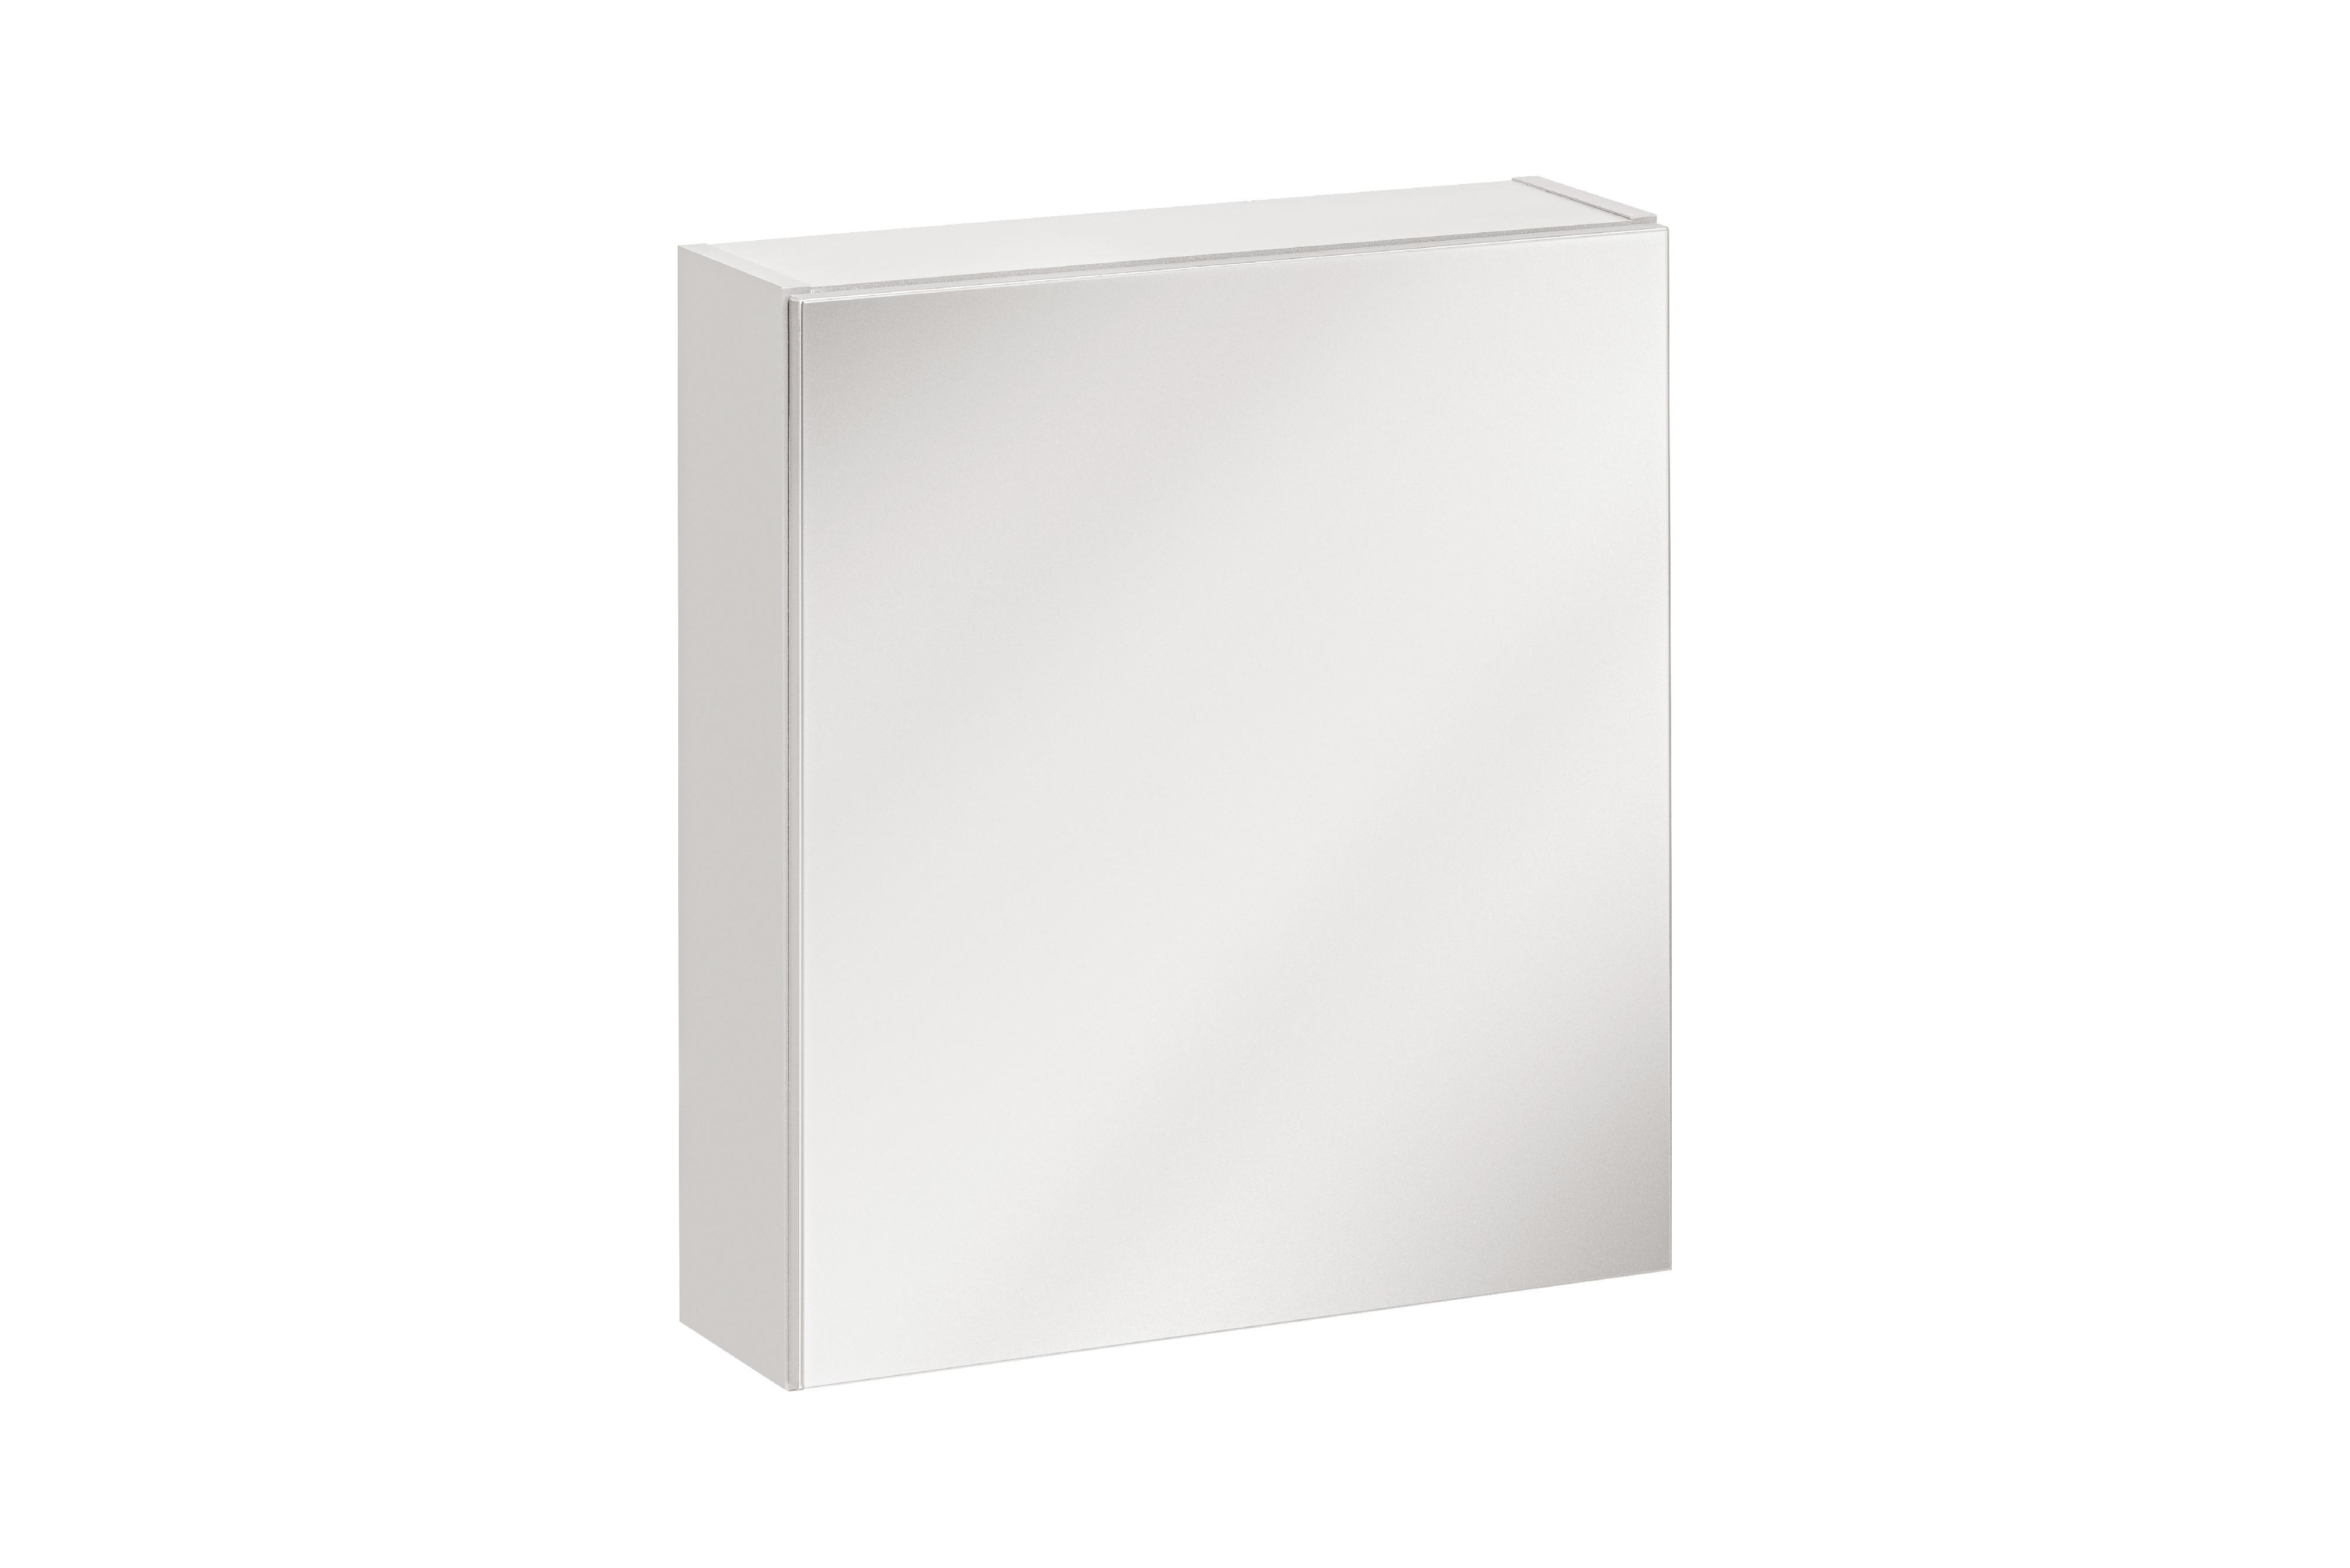 ArtCom Kúpeľňová zostava TWIST / BIELA Twist: zrkadlová skrinka Twist 840: 50 x 55 x 15 cm